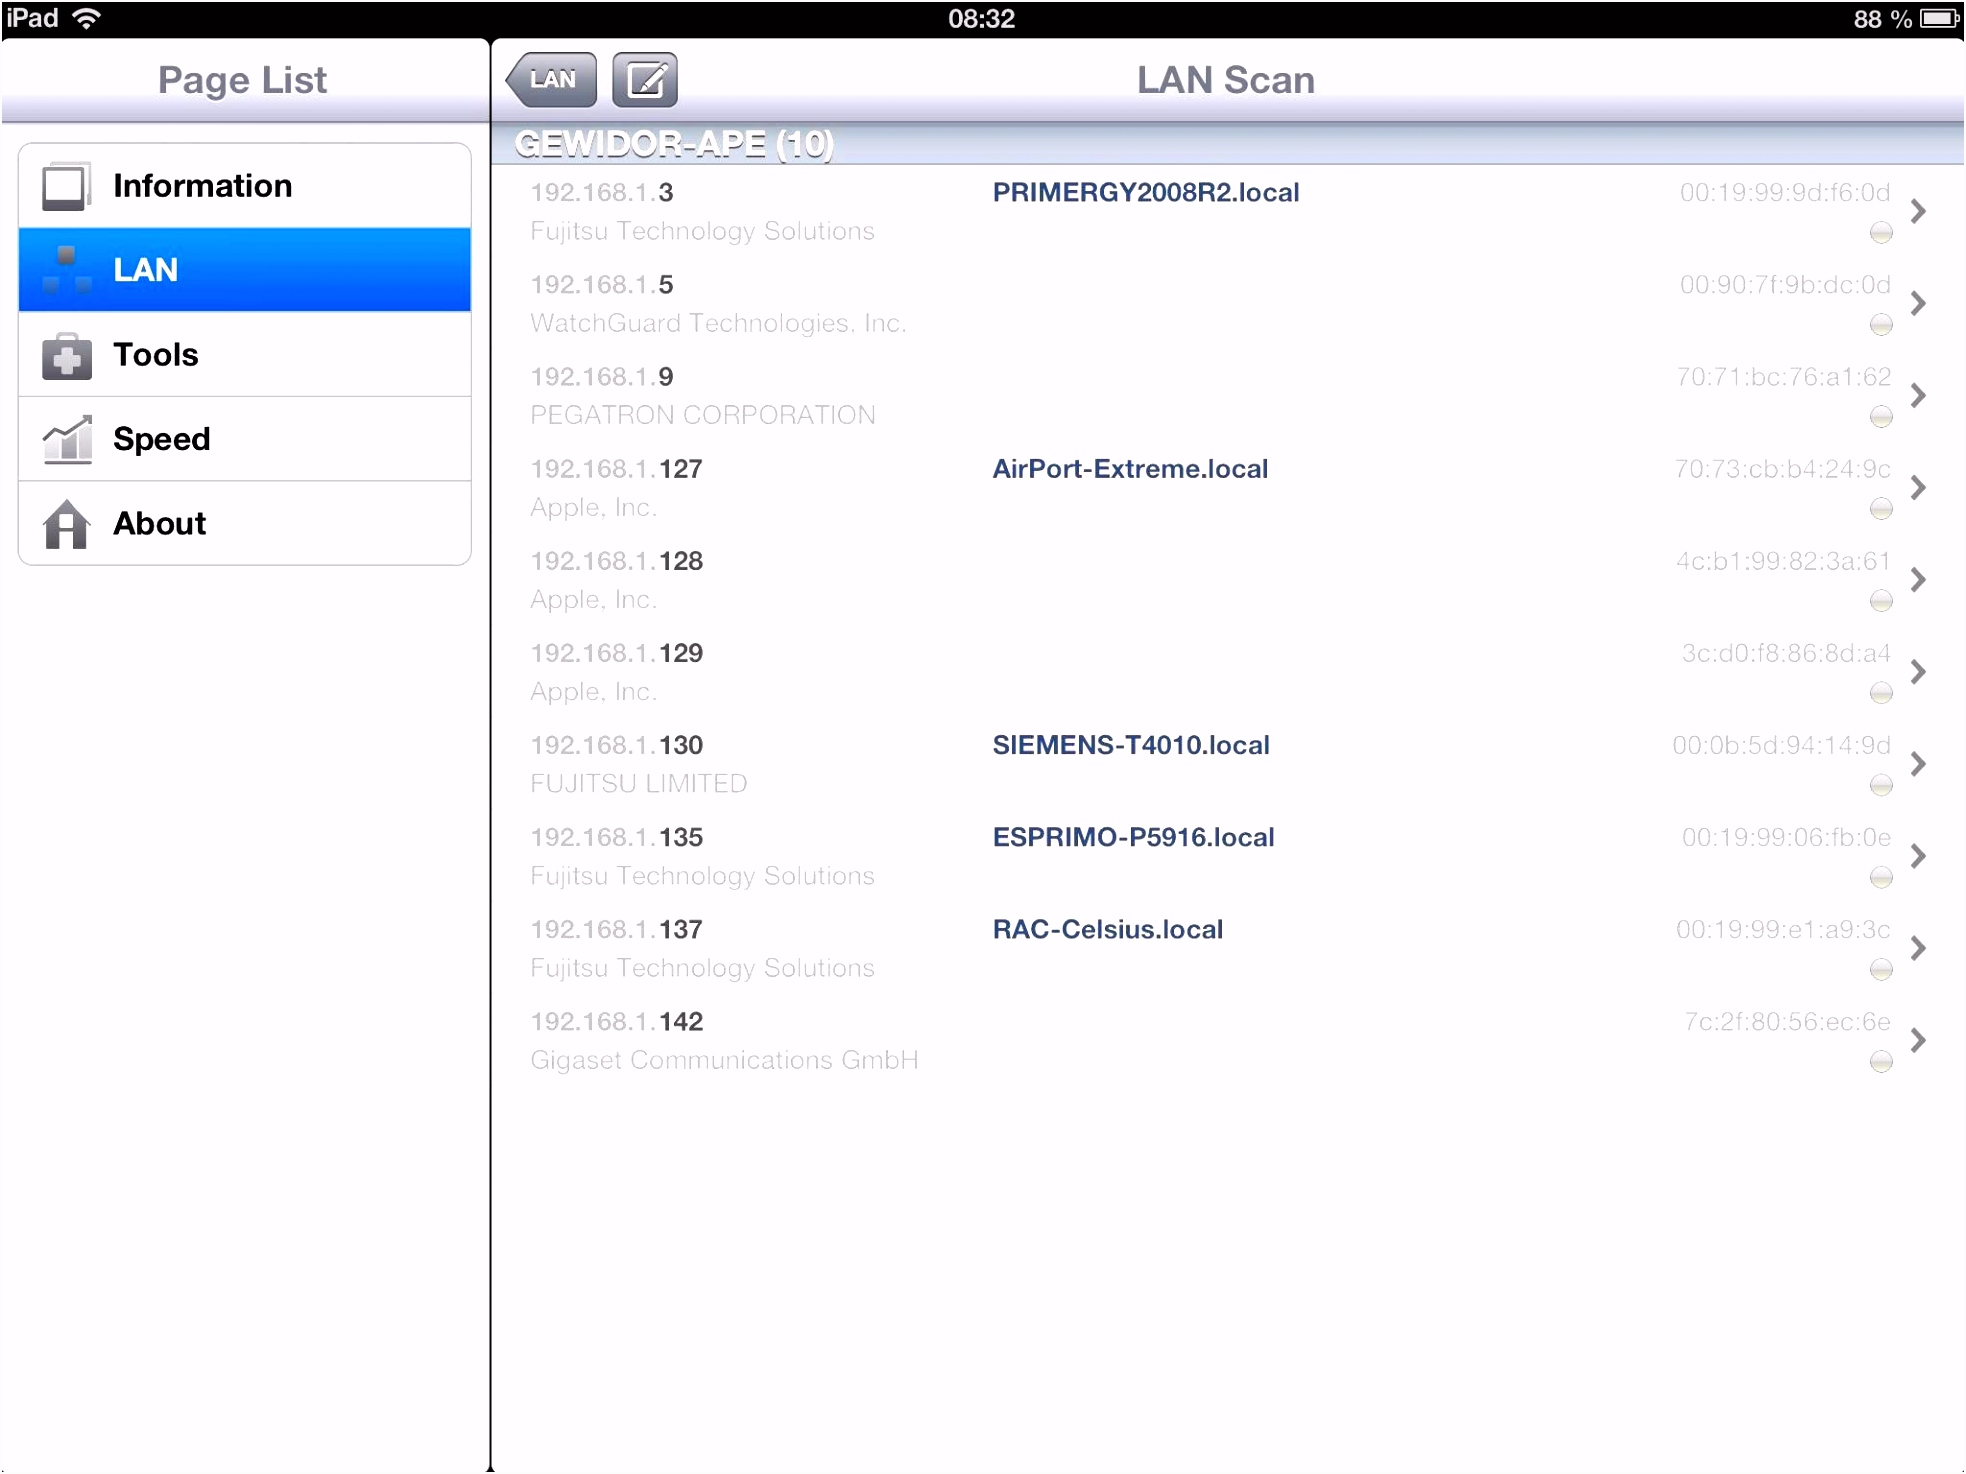 Node Js Spreadsheet or HTML Templates Kostenlos Models HTML Email